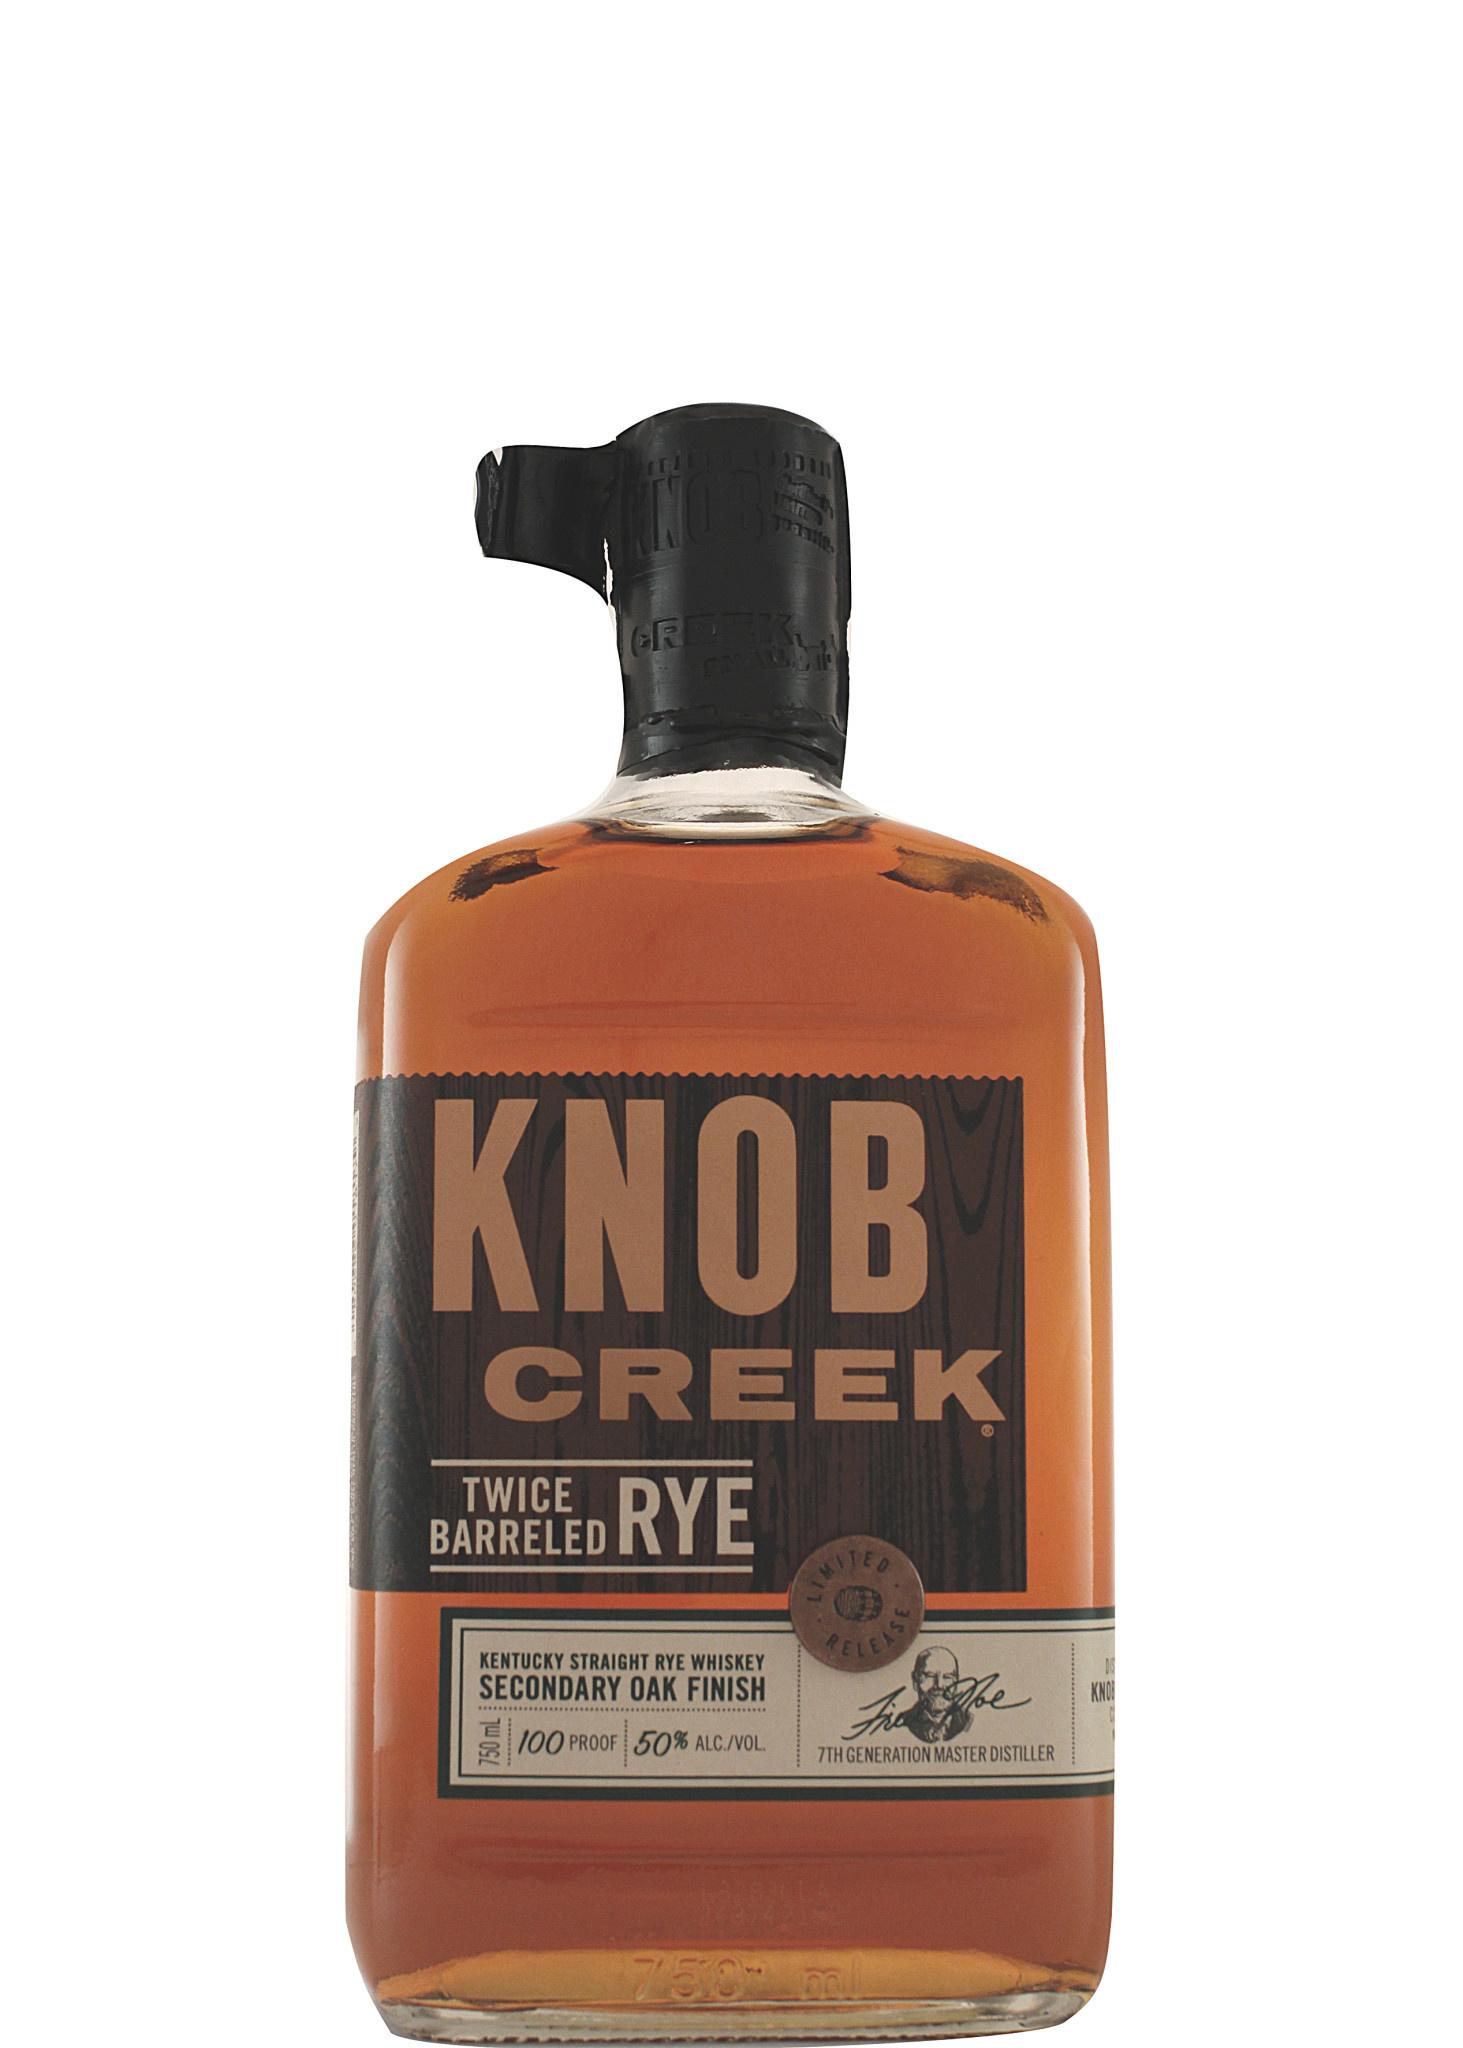 Knob Creek Twice Barreled Rye Whiskey